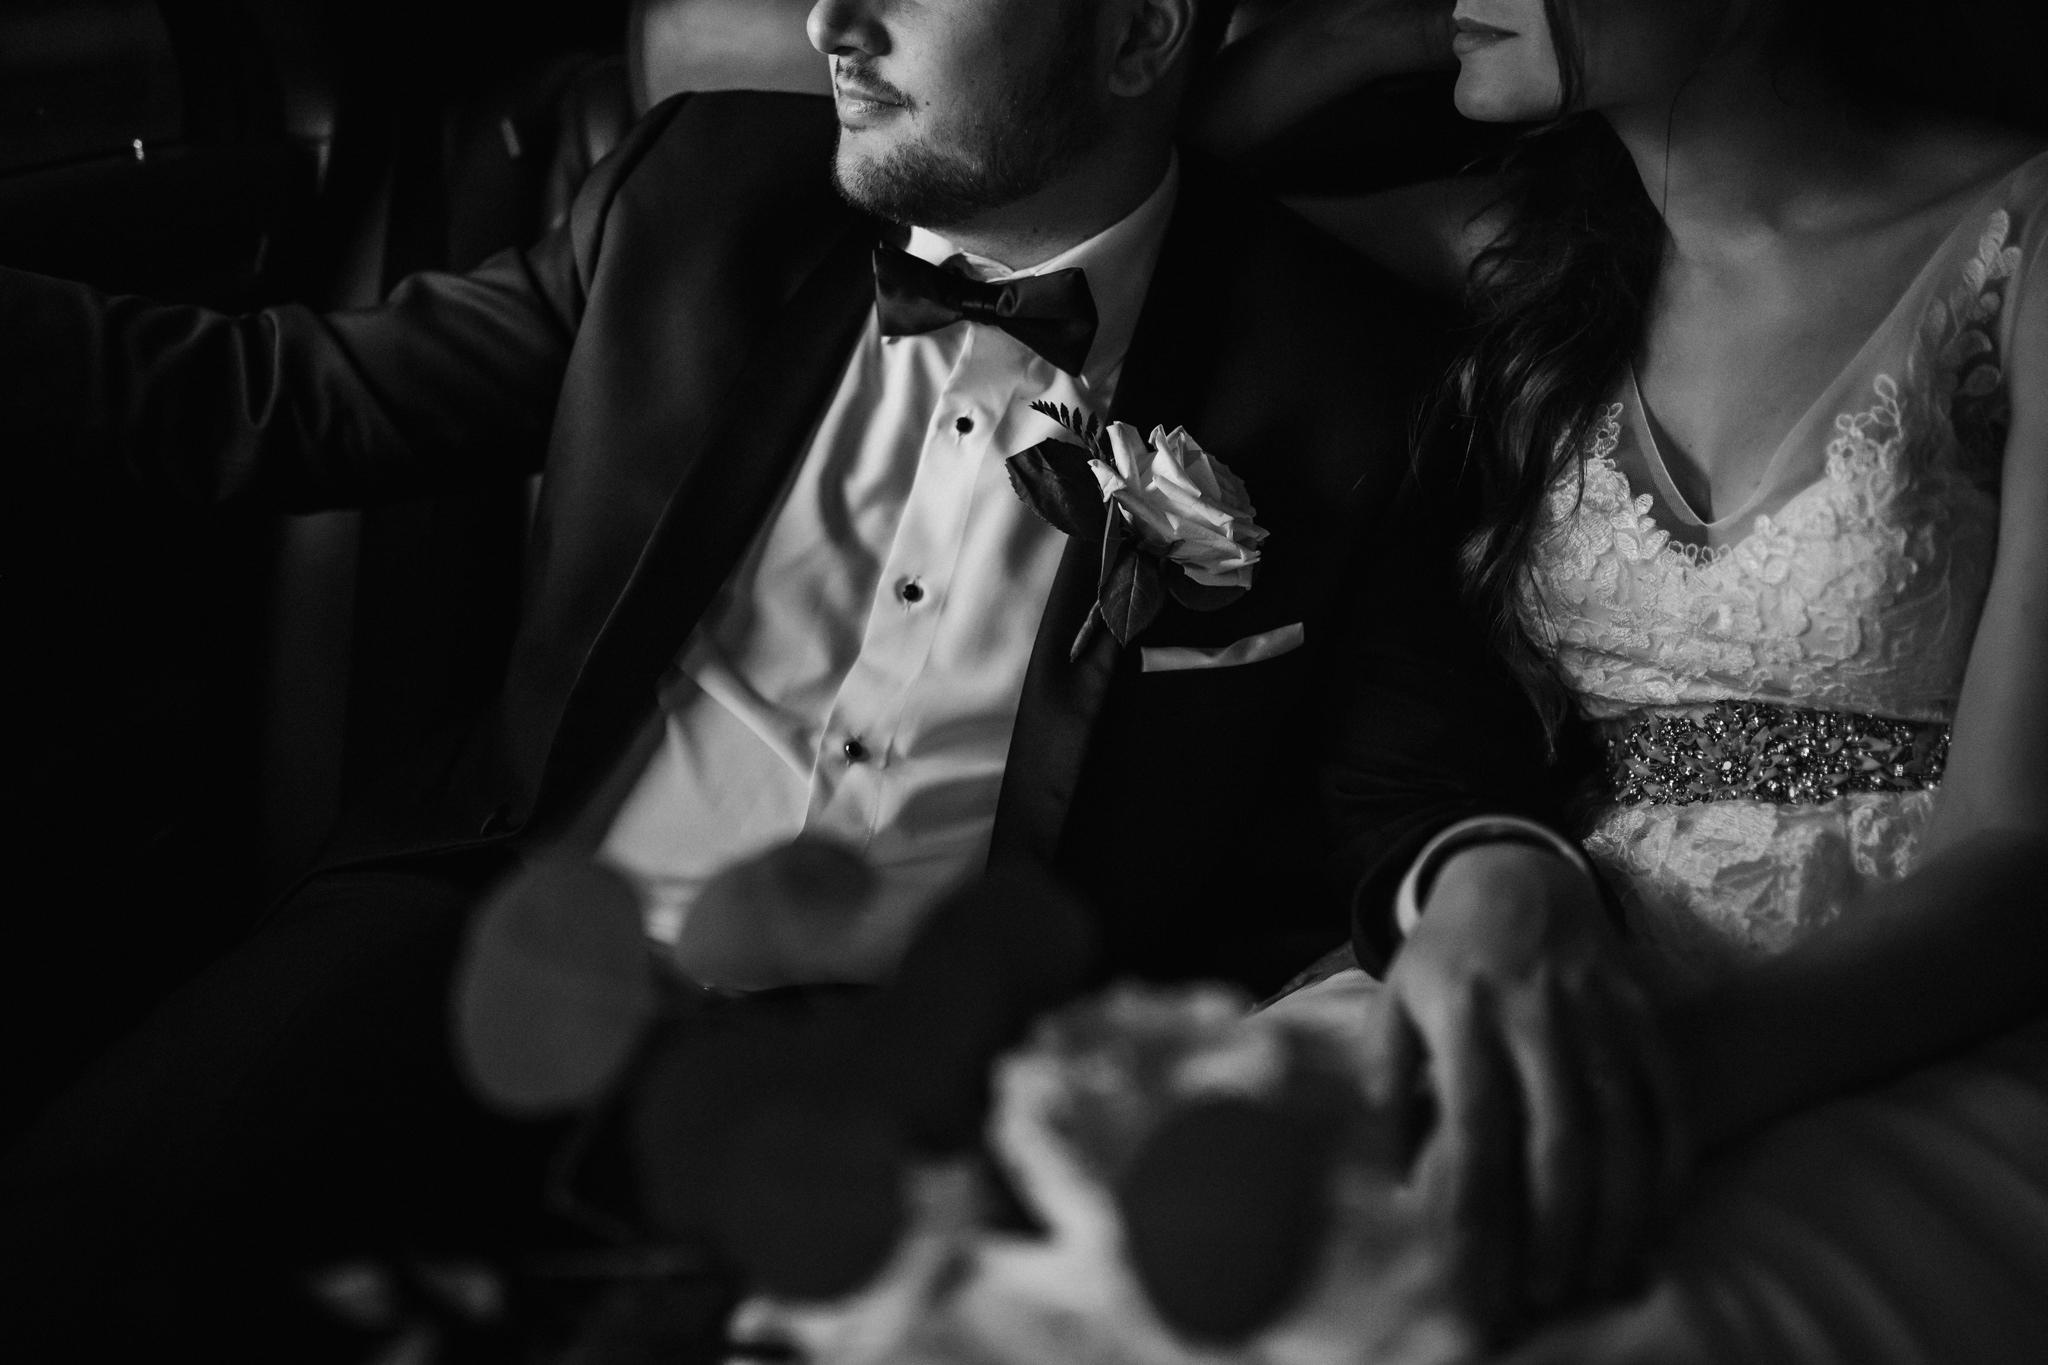 cassie-cook-photography-memphis-wedding-photographer-the-atrium-at-overton-square-78.jpg